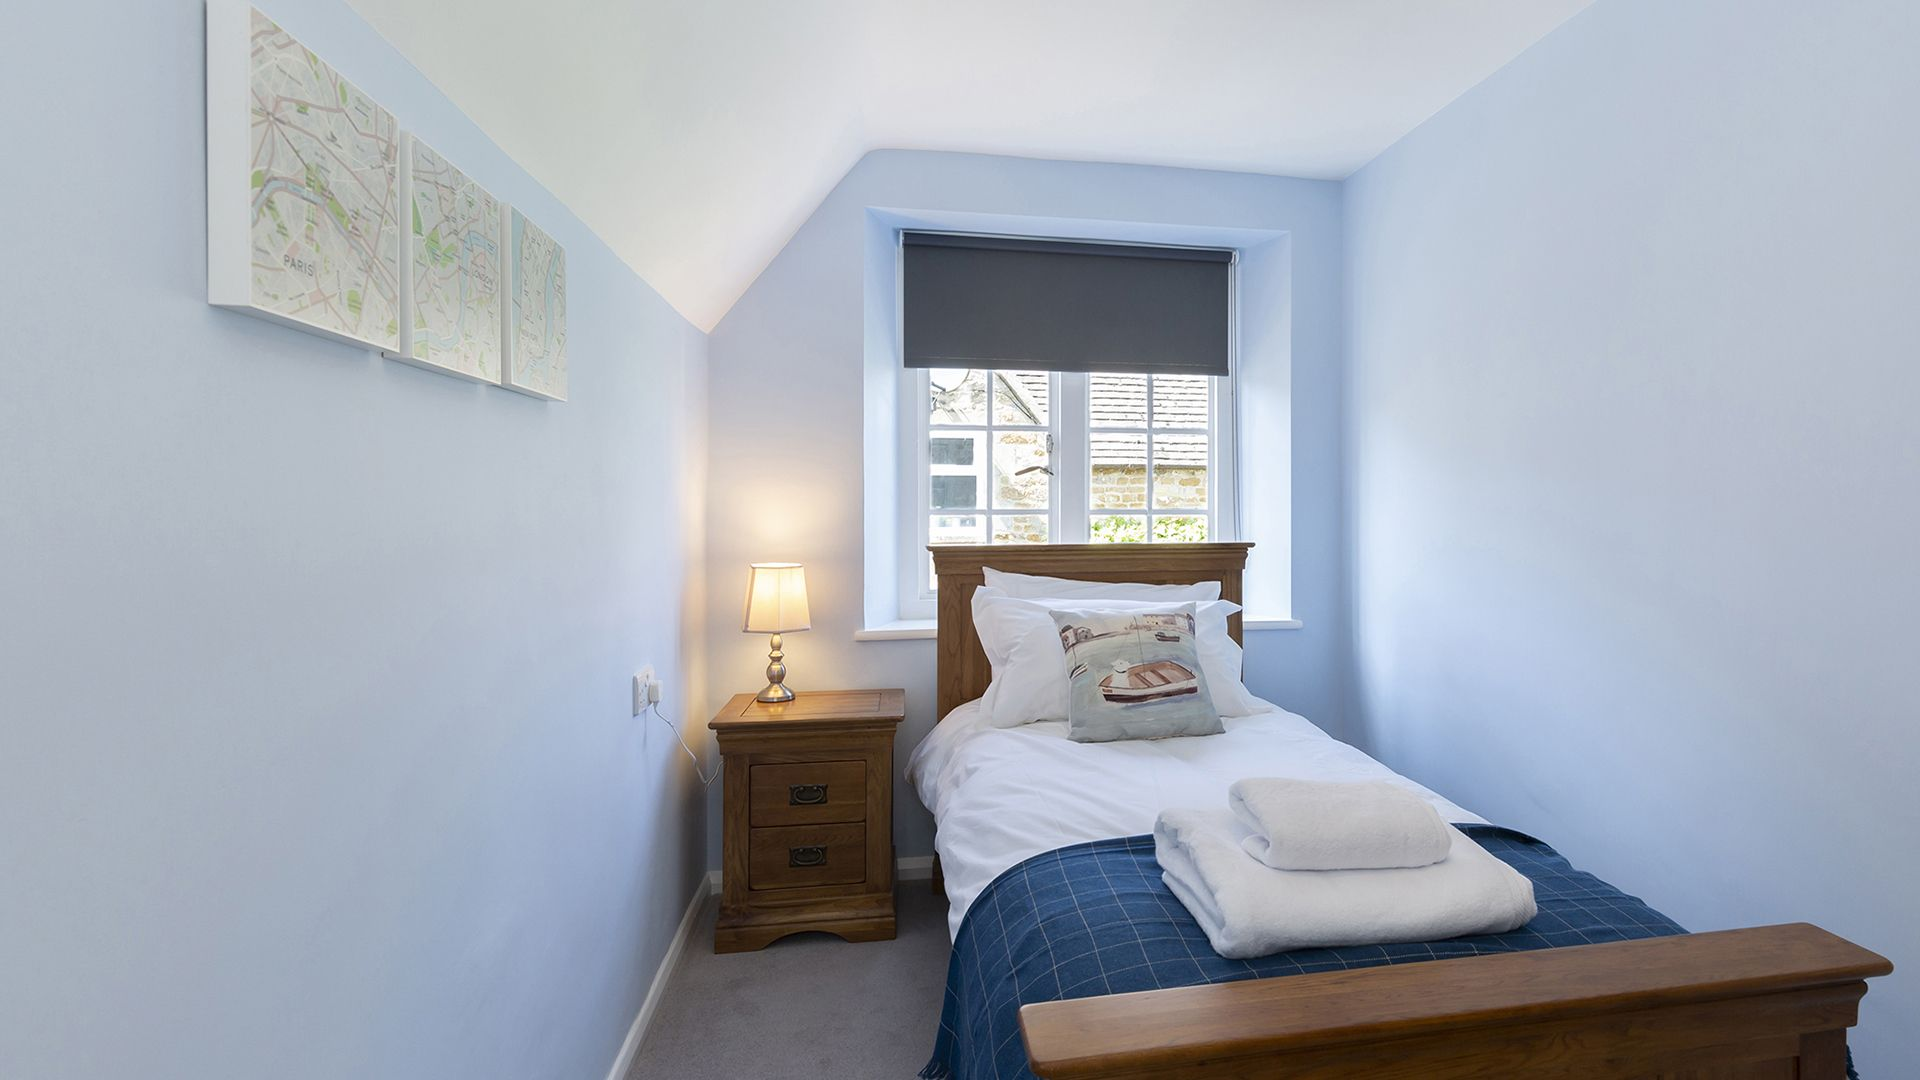 Bedroom 4, South Winds, Bolthole Retreats